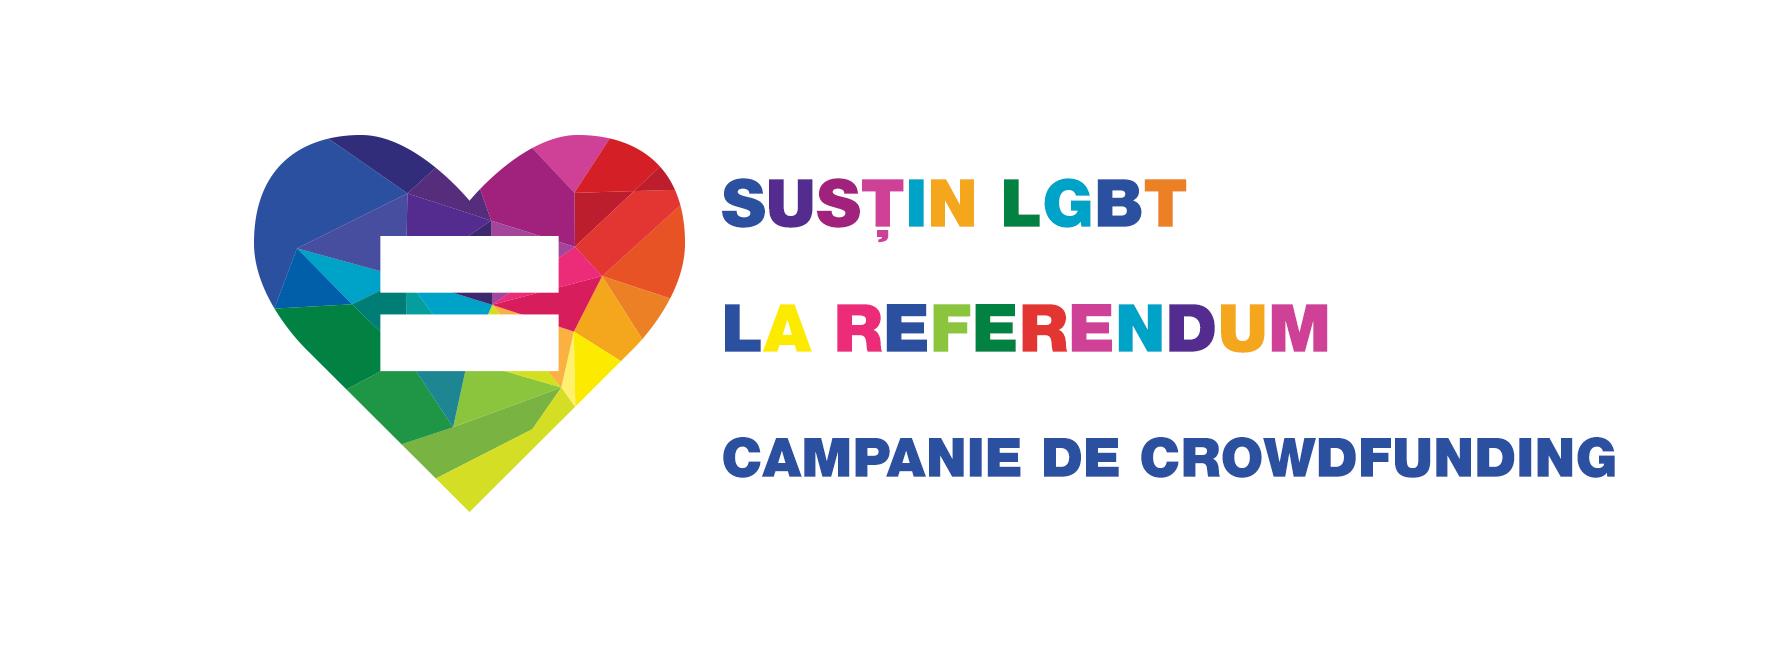 Susțin LGBT la referendum: crowdfunding